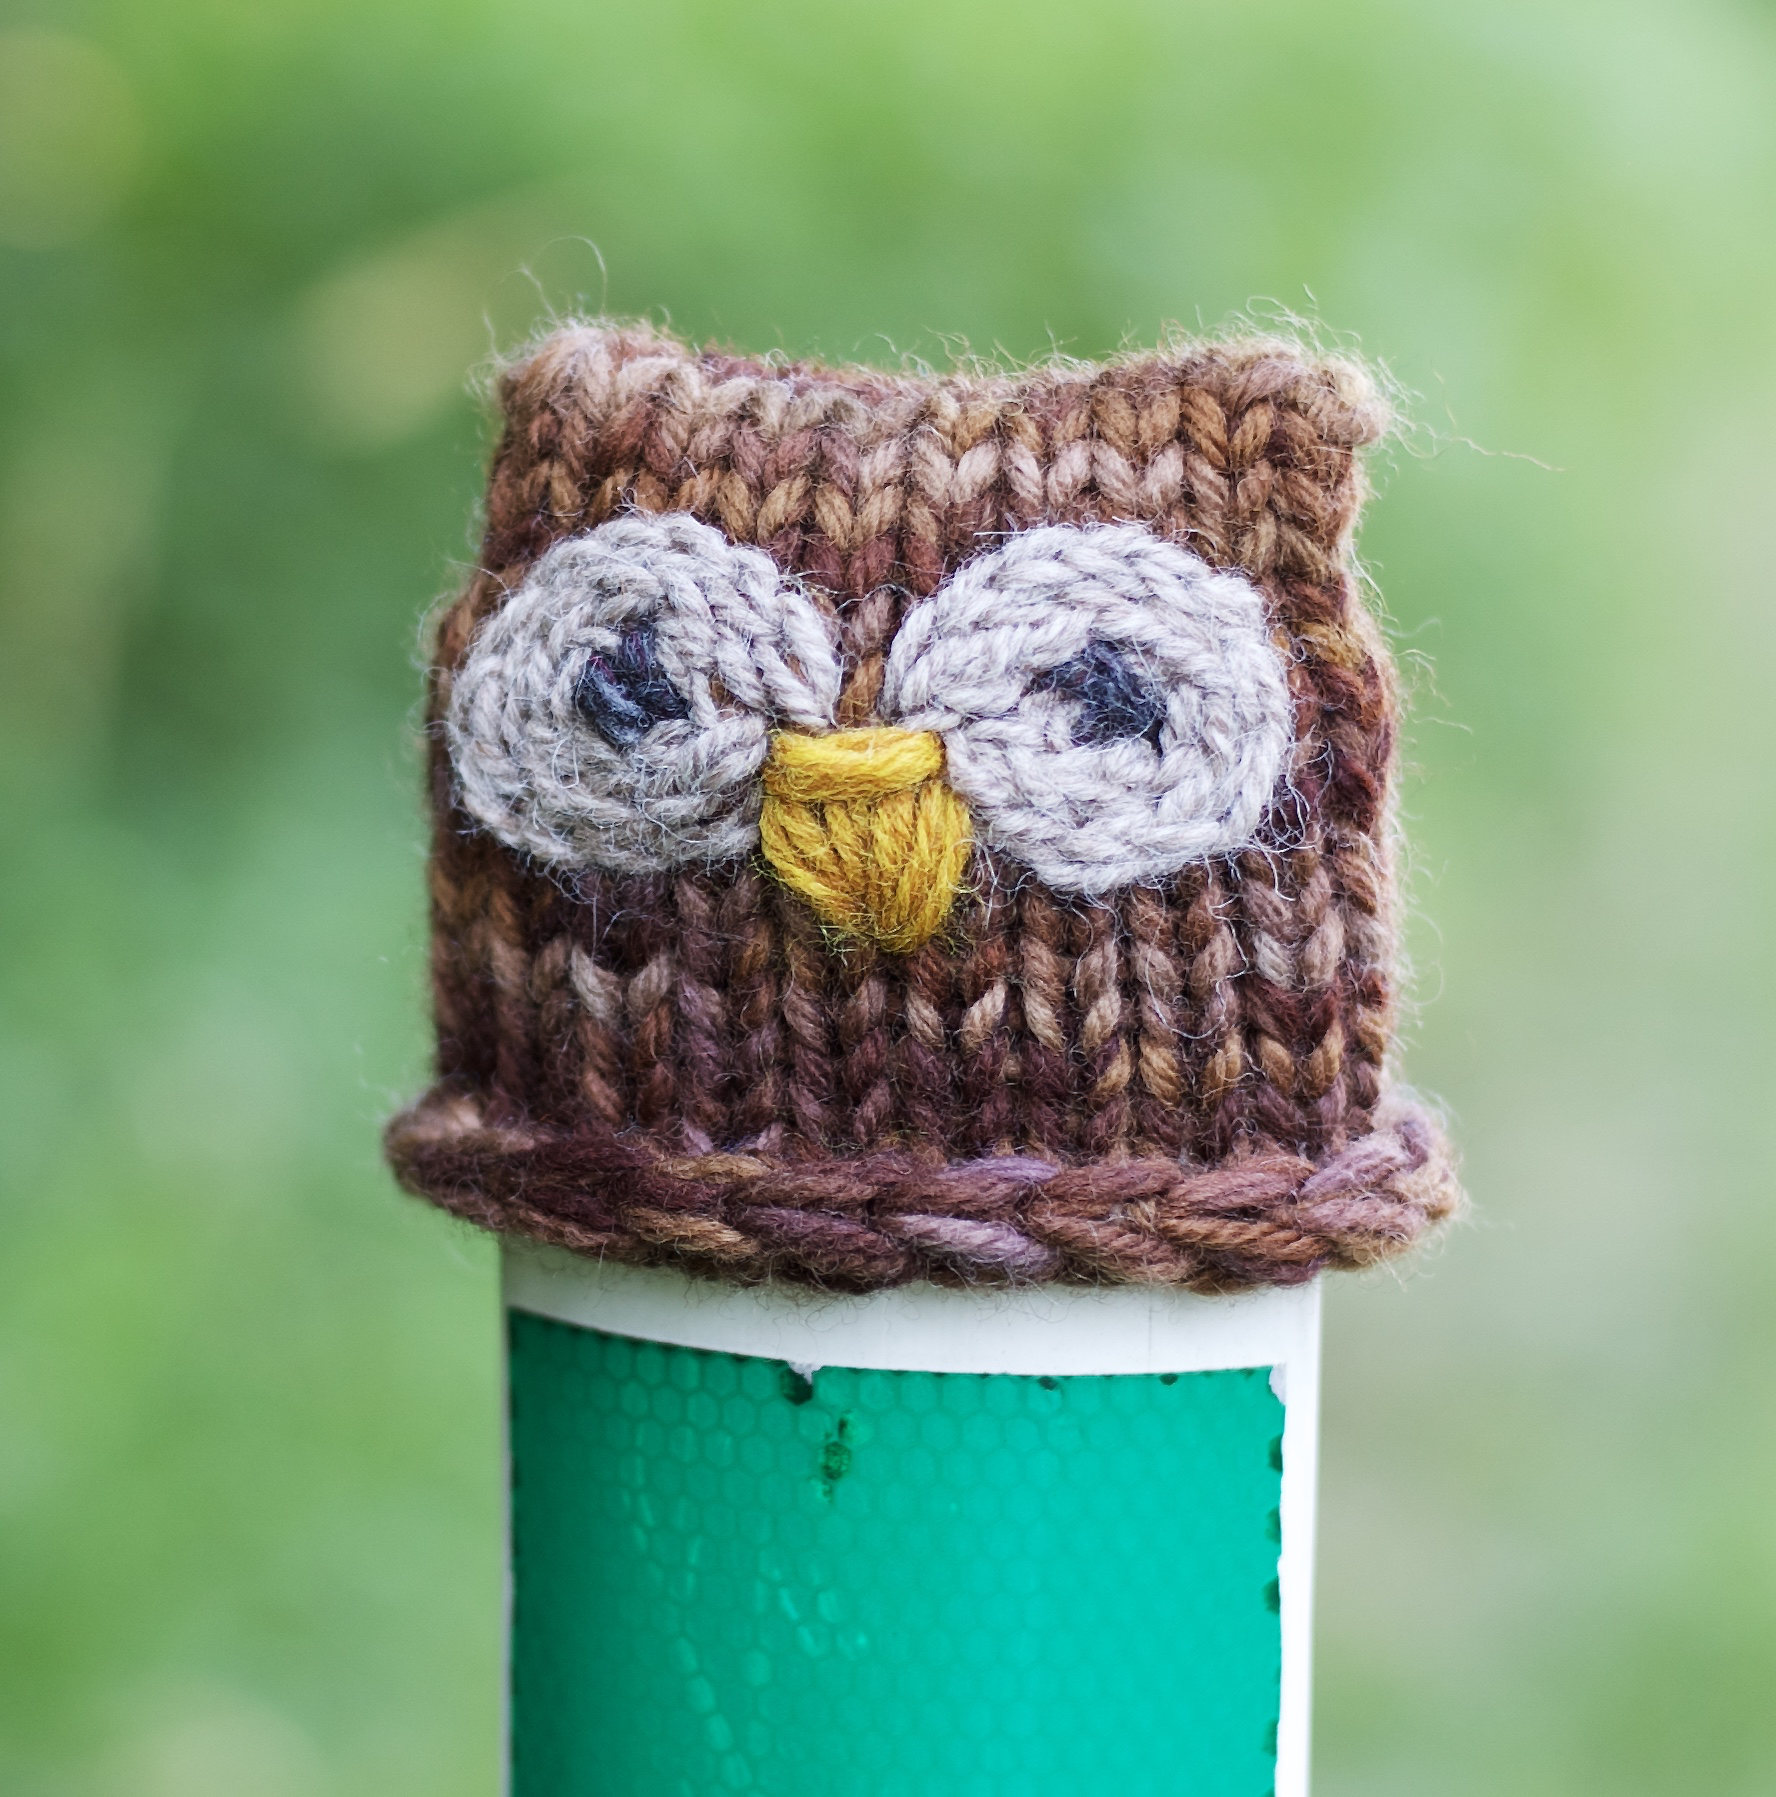 Owl. Southwest Path. Madison, Wisconsin. July 2013. © William D. Walker